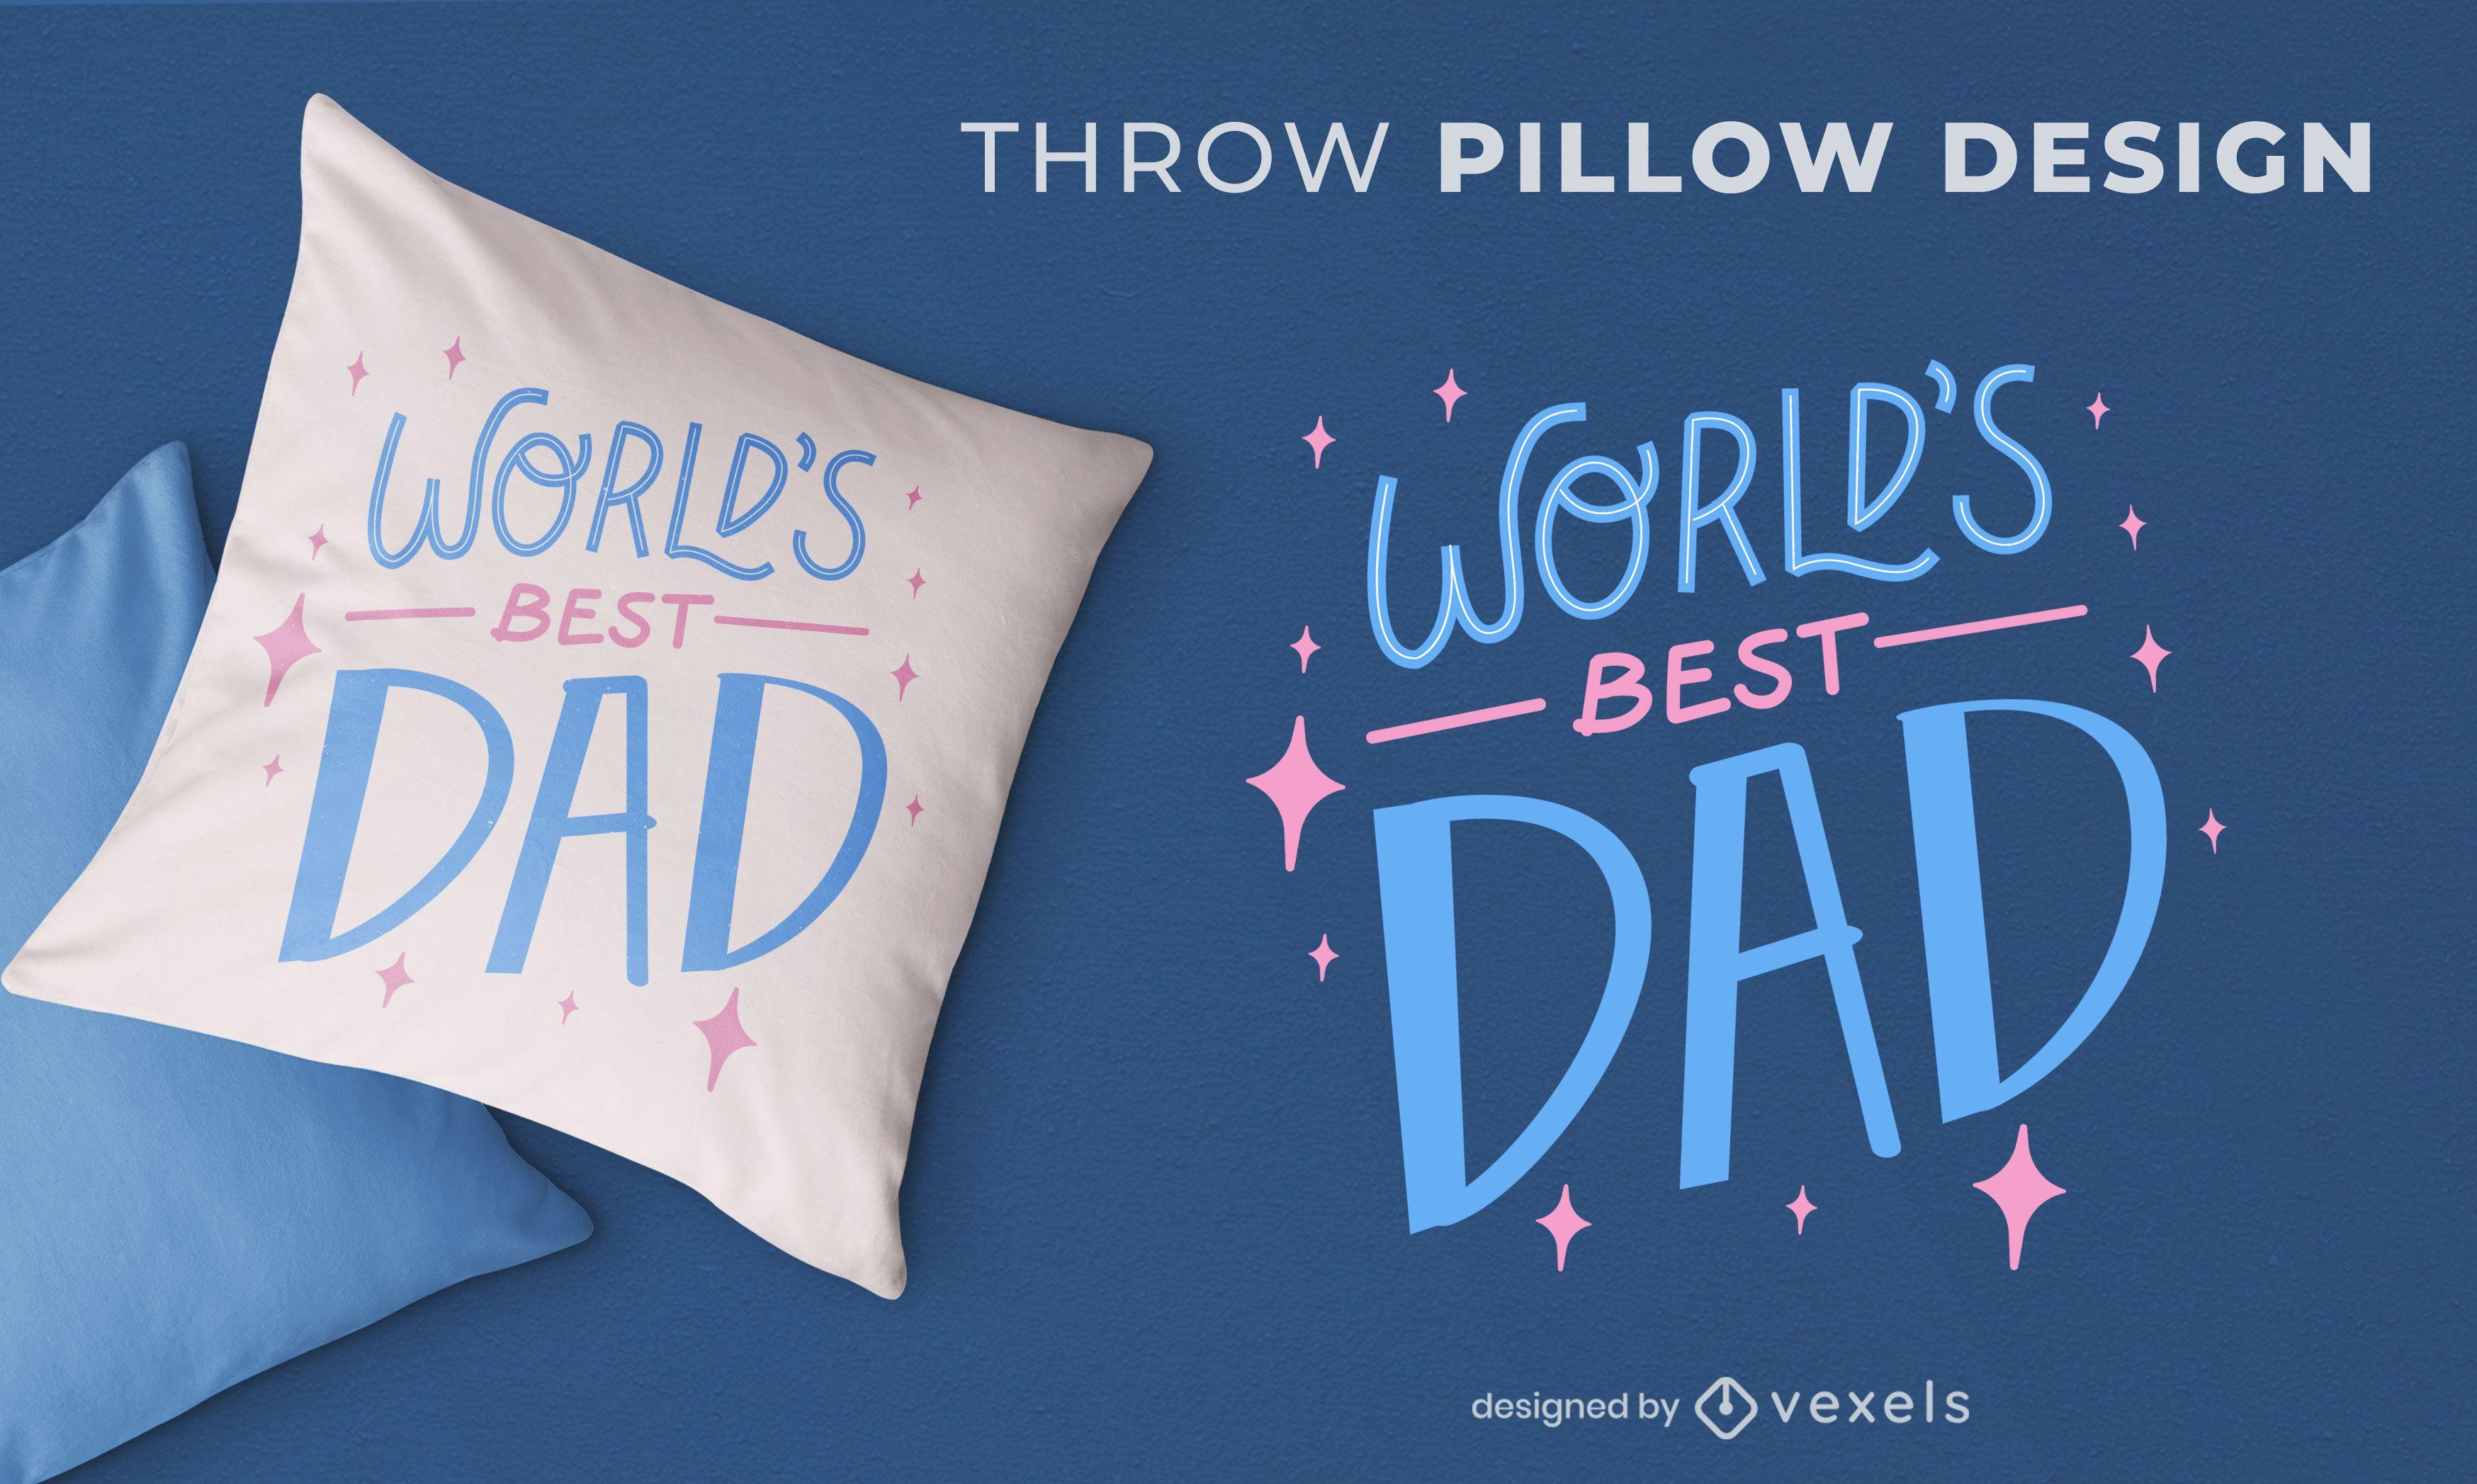 Best dad quote throw pillow design